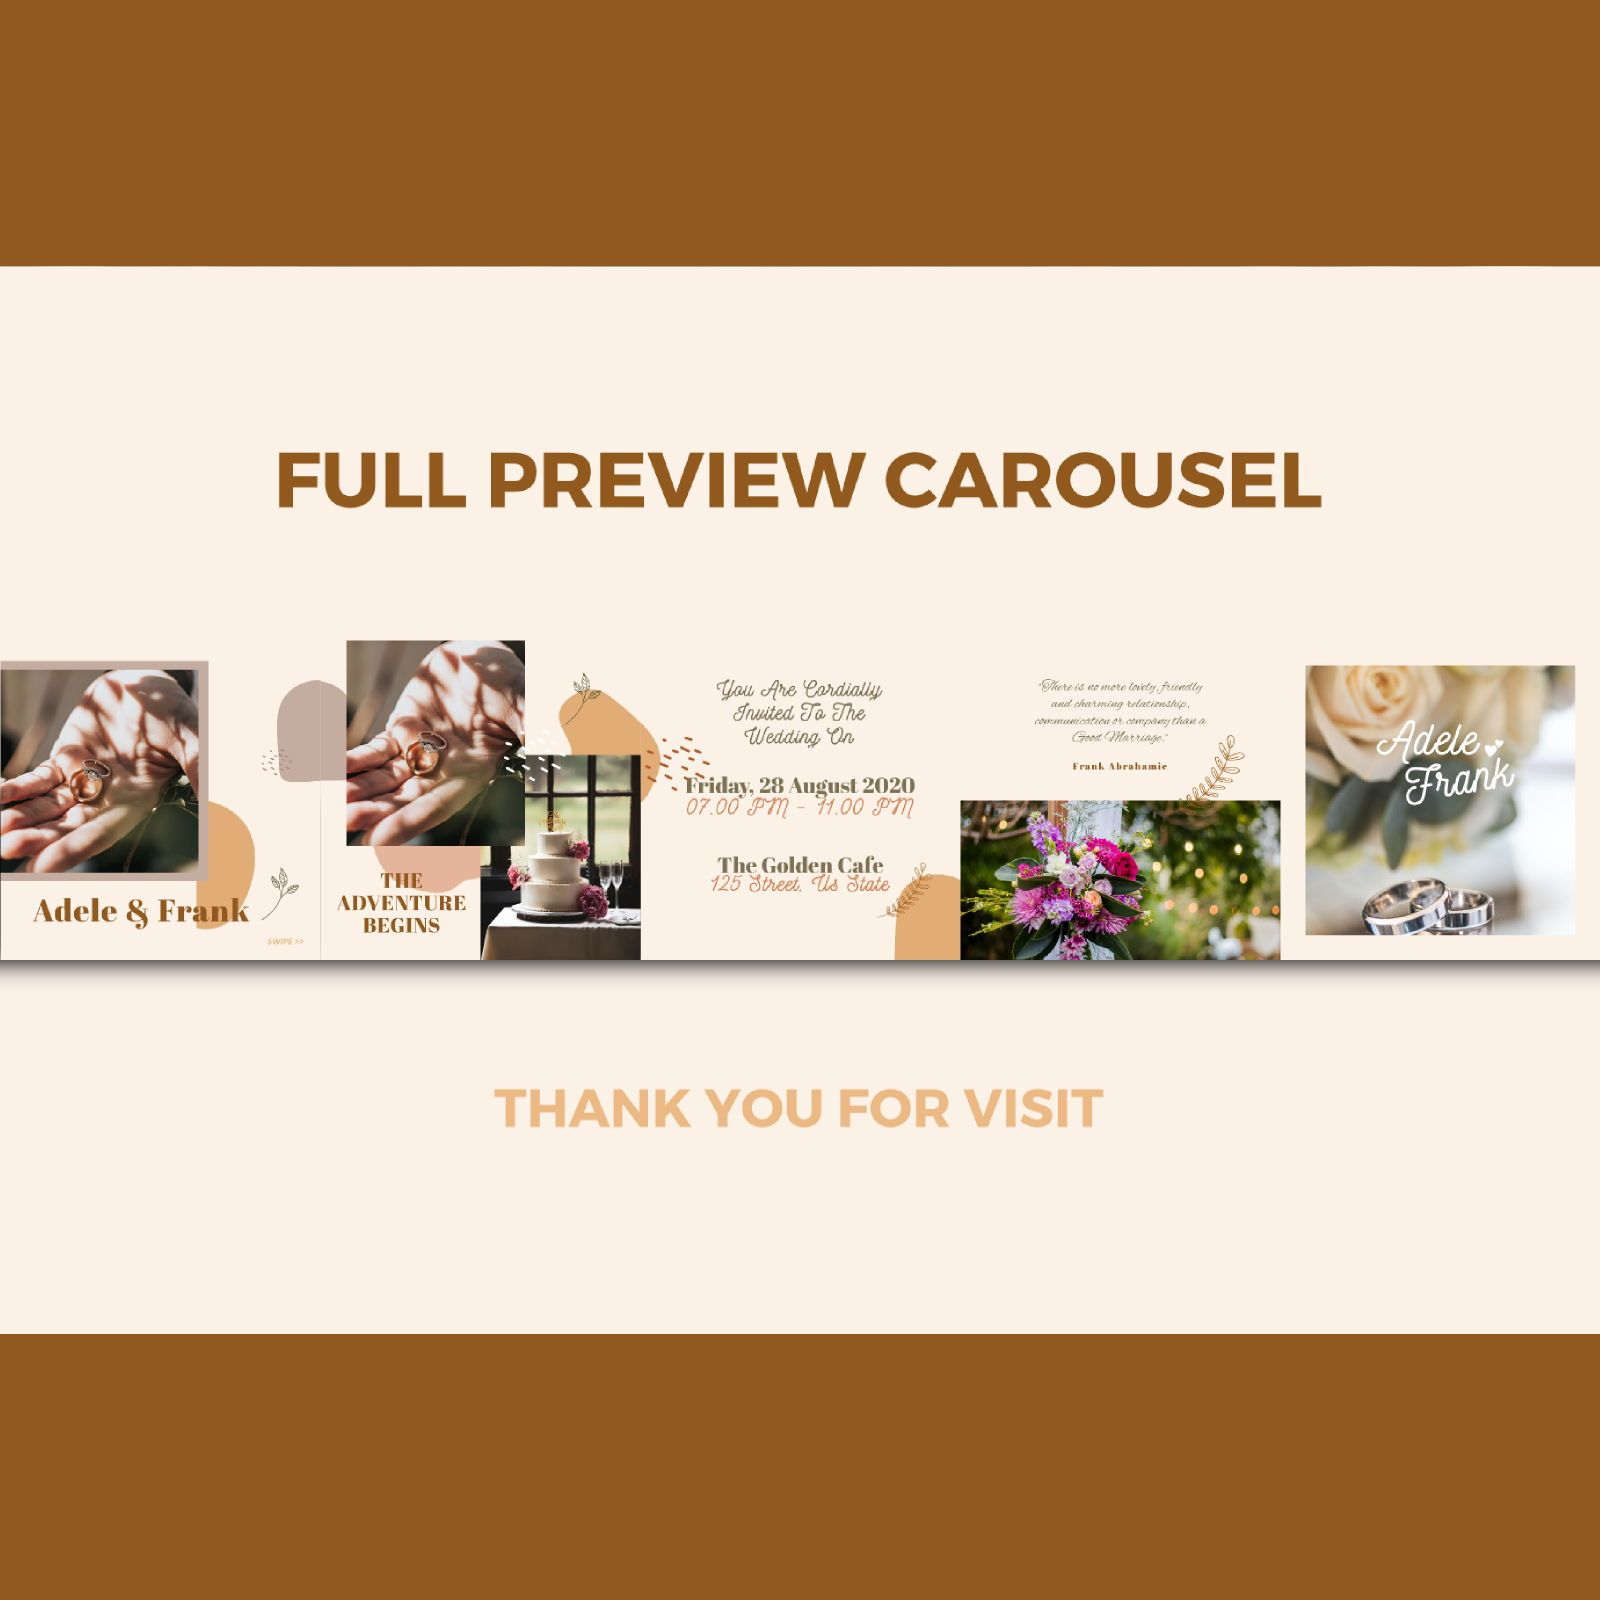 Wedding invitation instagram carousel powerpoint template, Slide 3, 07608, Presentation Templates — PoweredTemplate.com